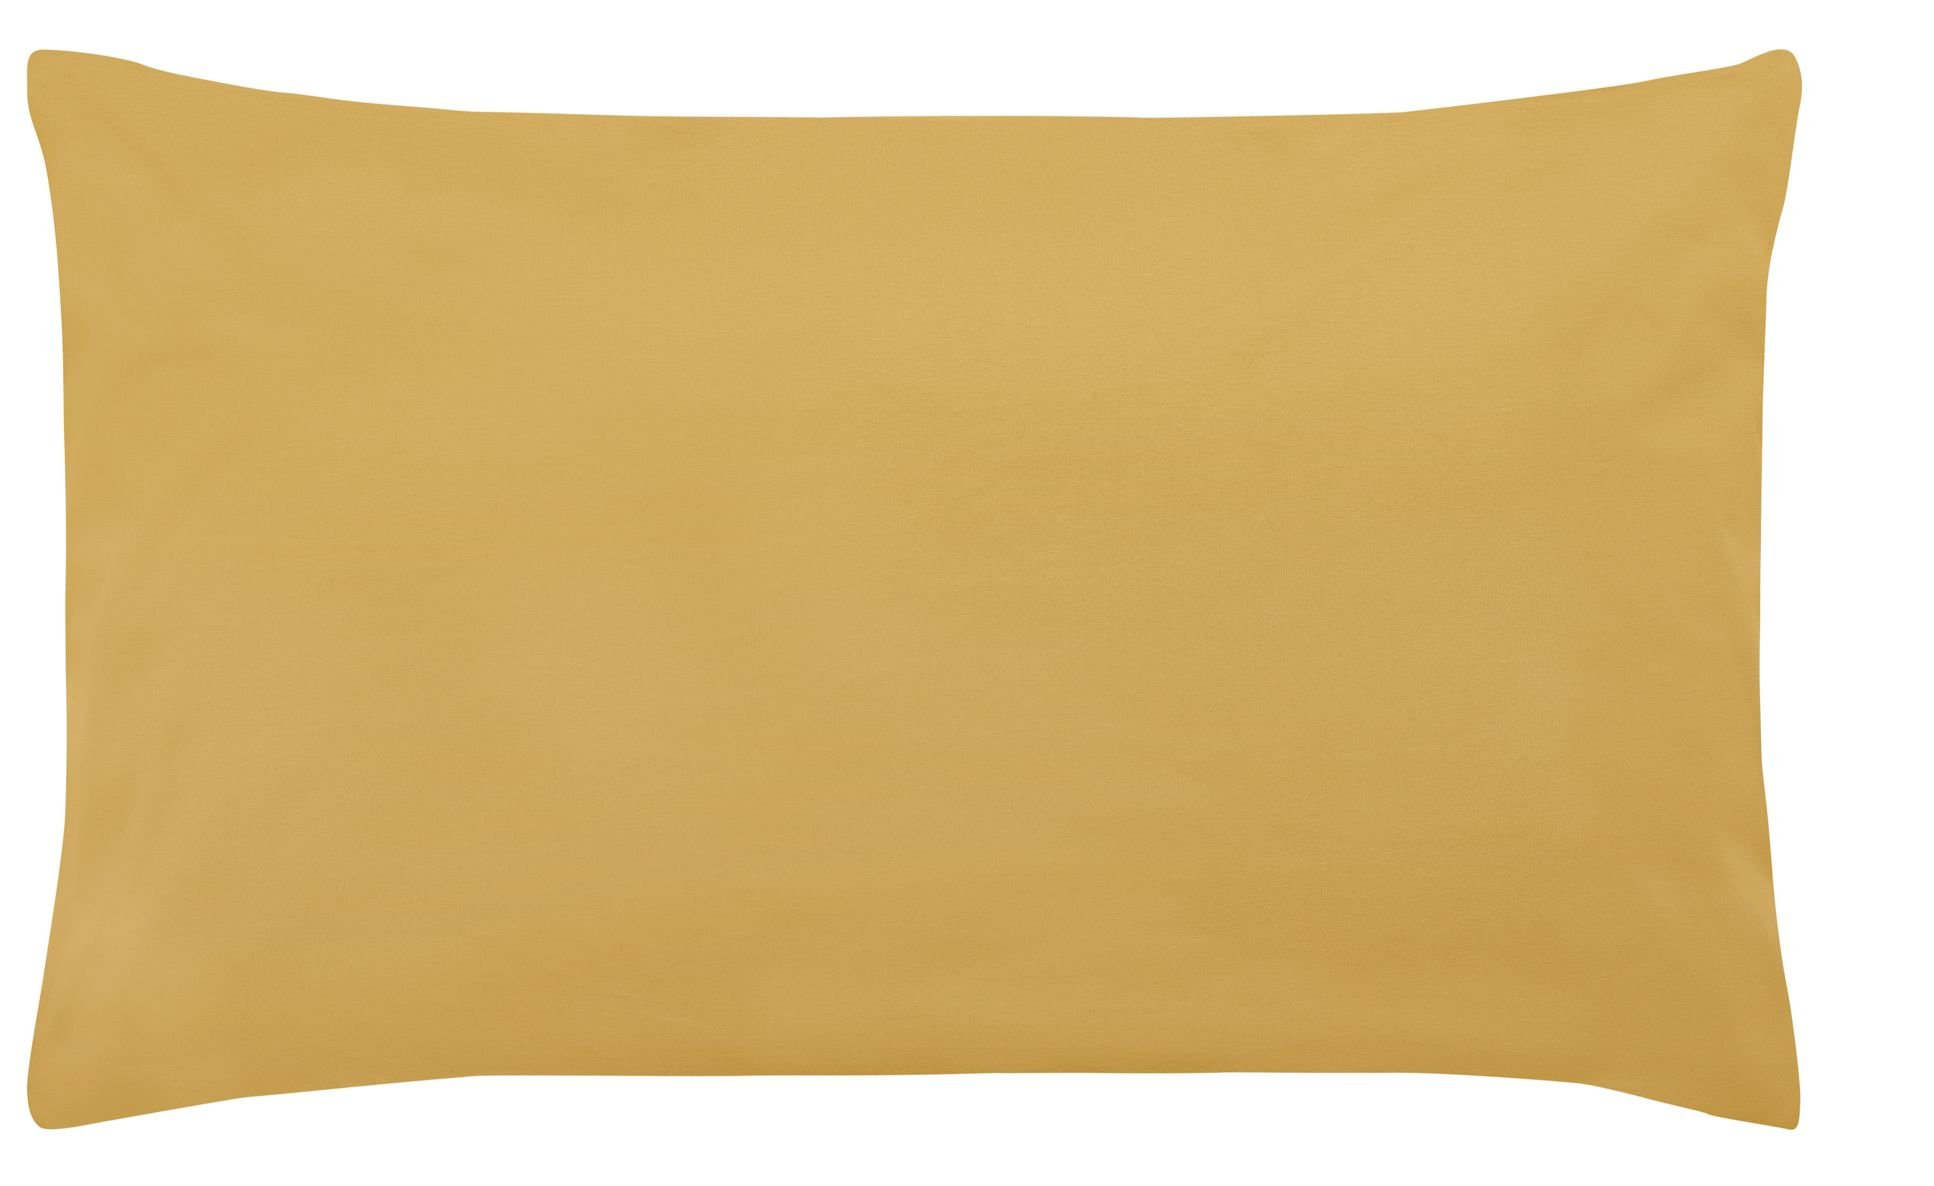 K.-Bezug curry 40x60cm